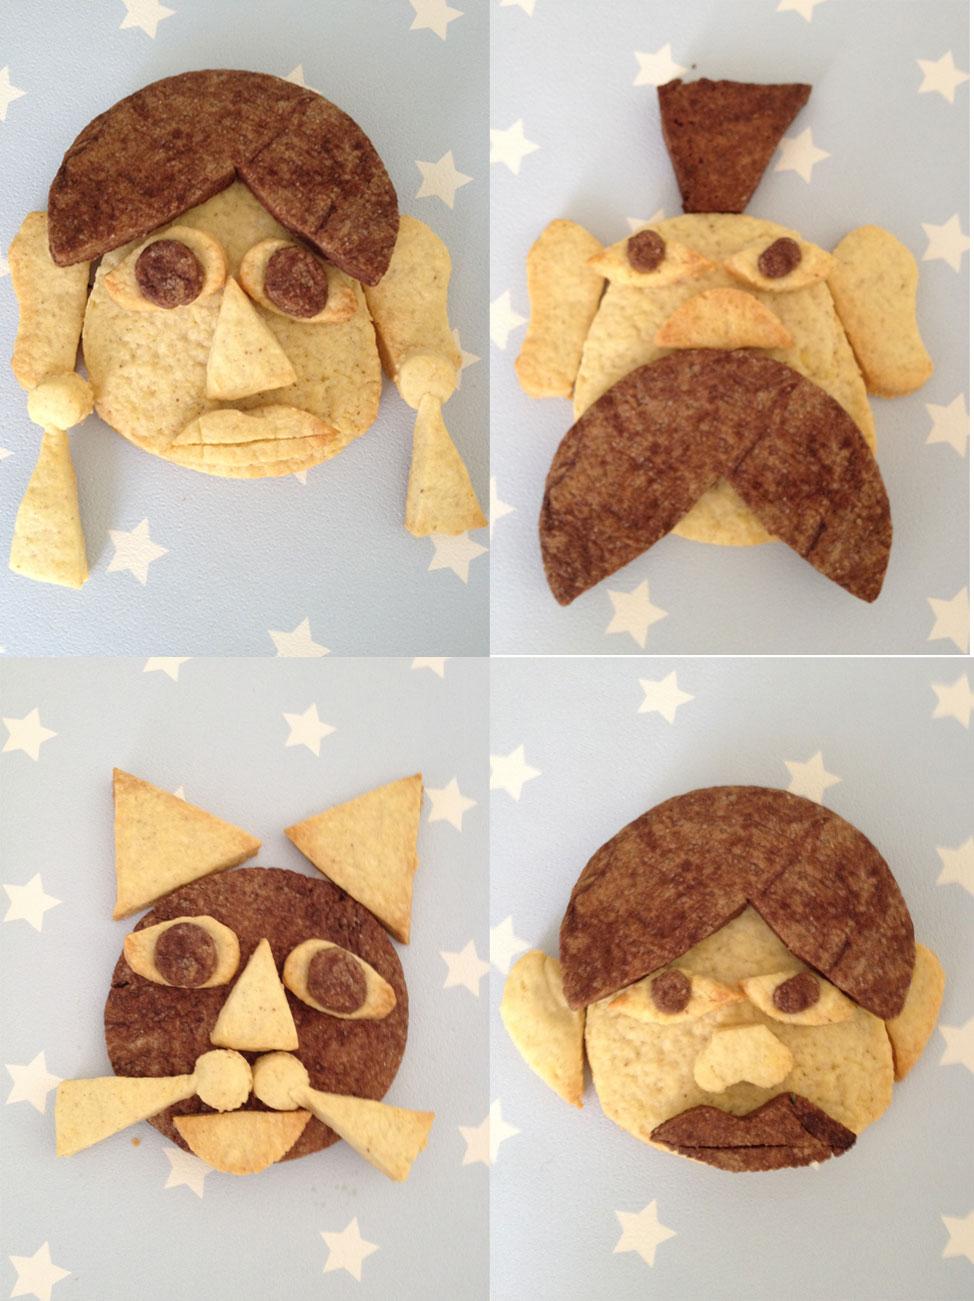 Identi-cookies